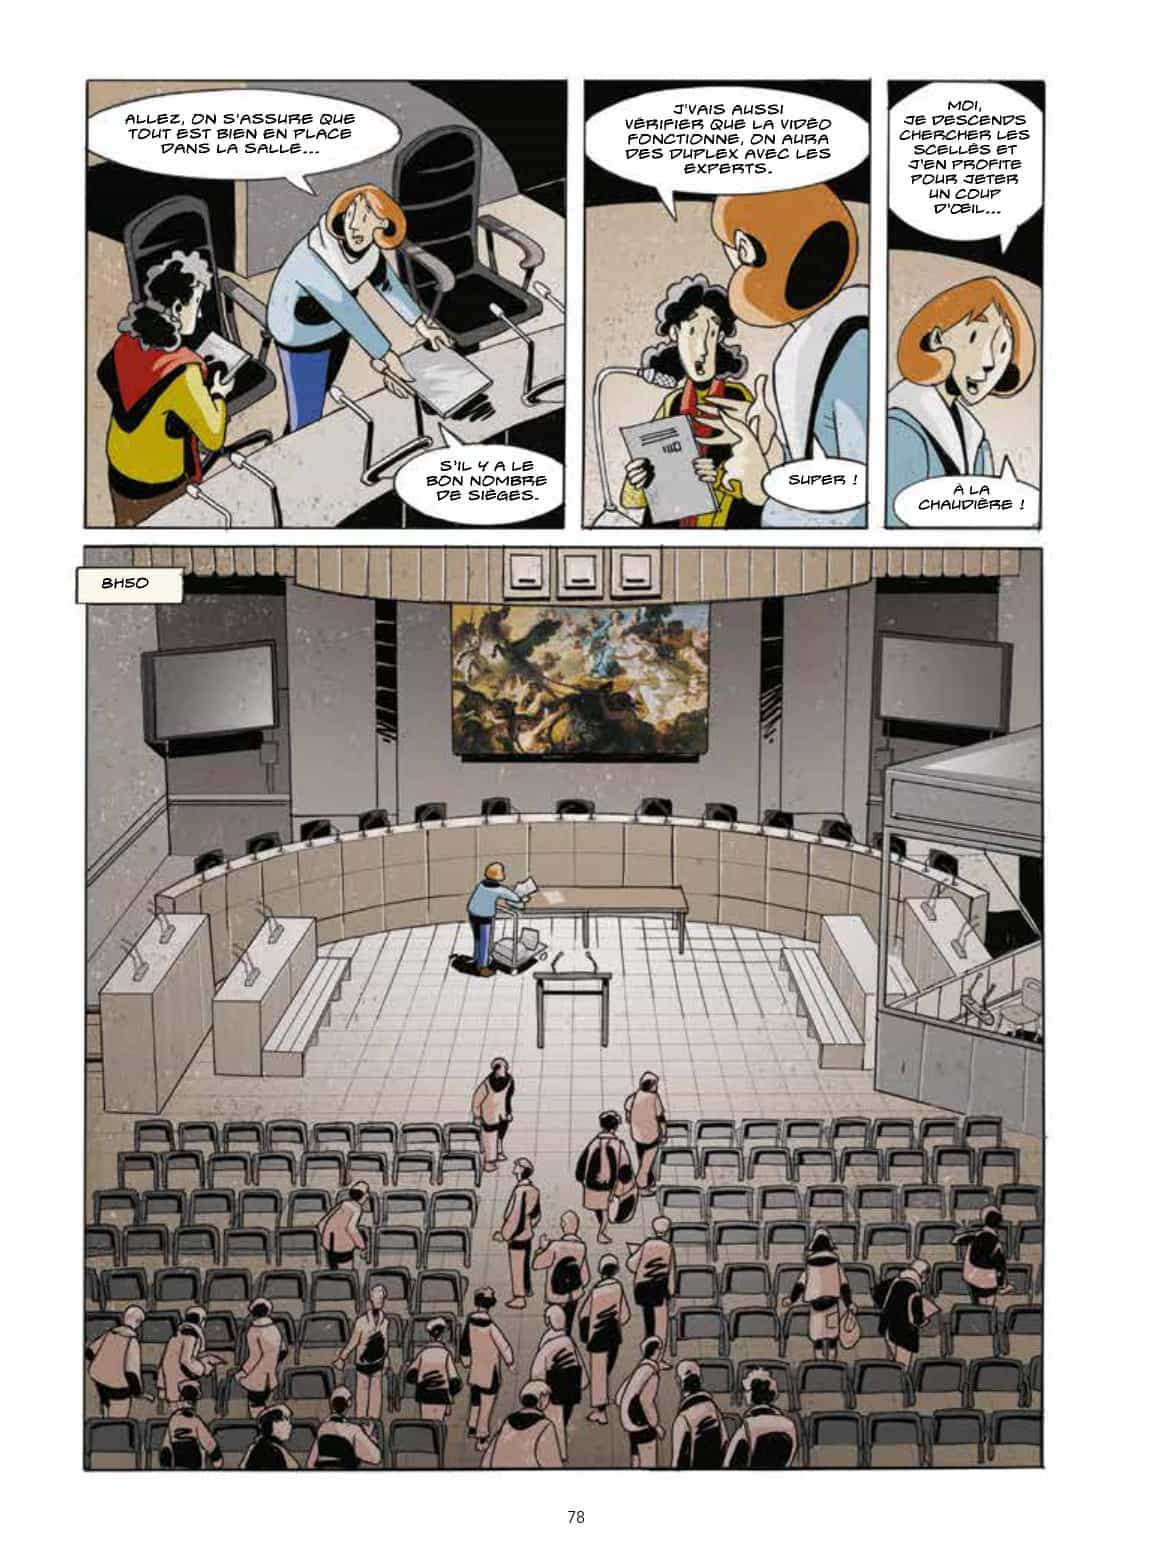 Le grand théâtre de la Justice (page 78 - Futuropolis, 2021).